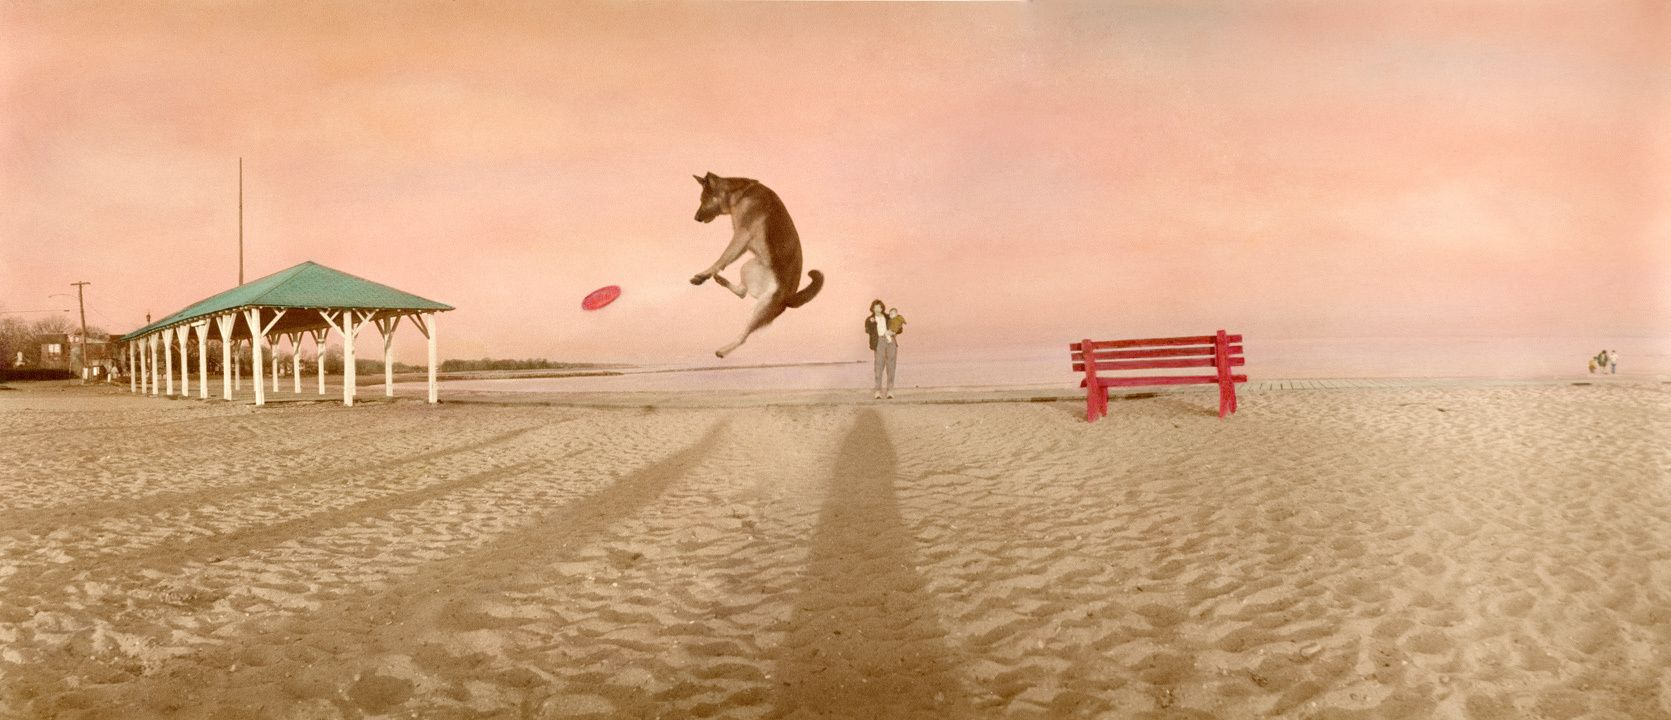 1who_threw_the_dog.jpg